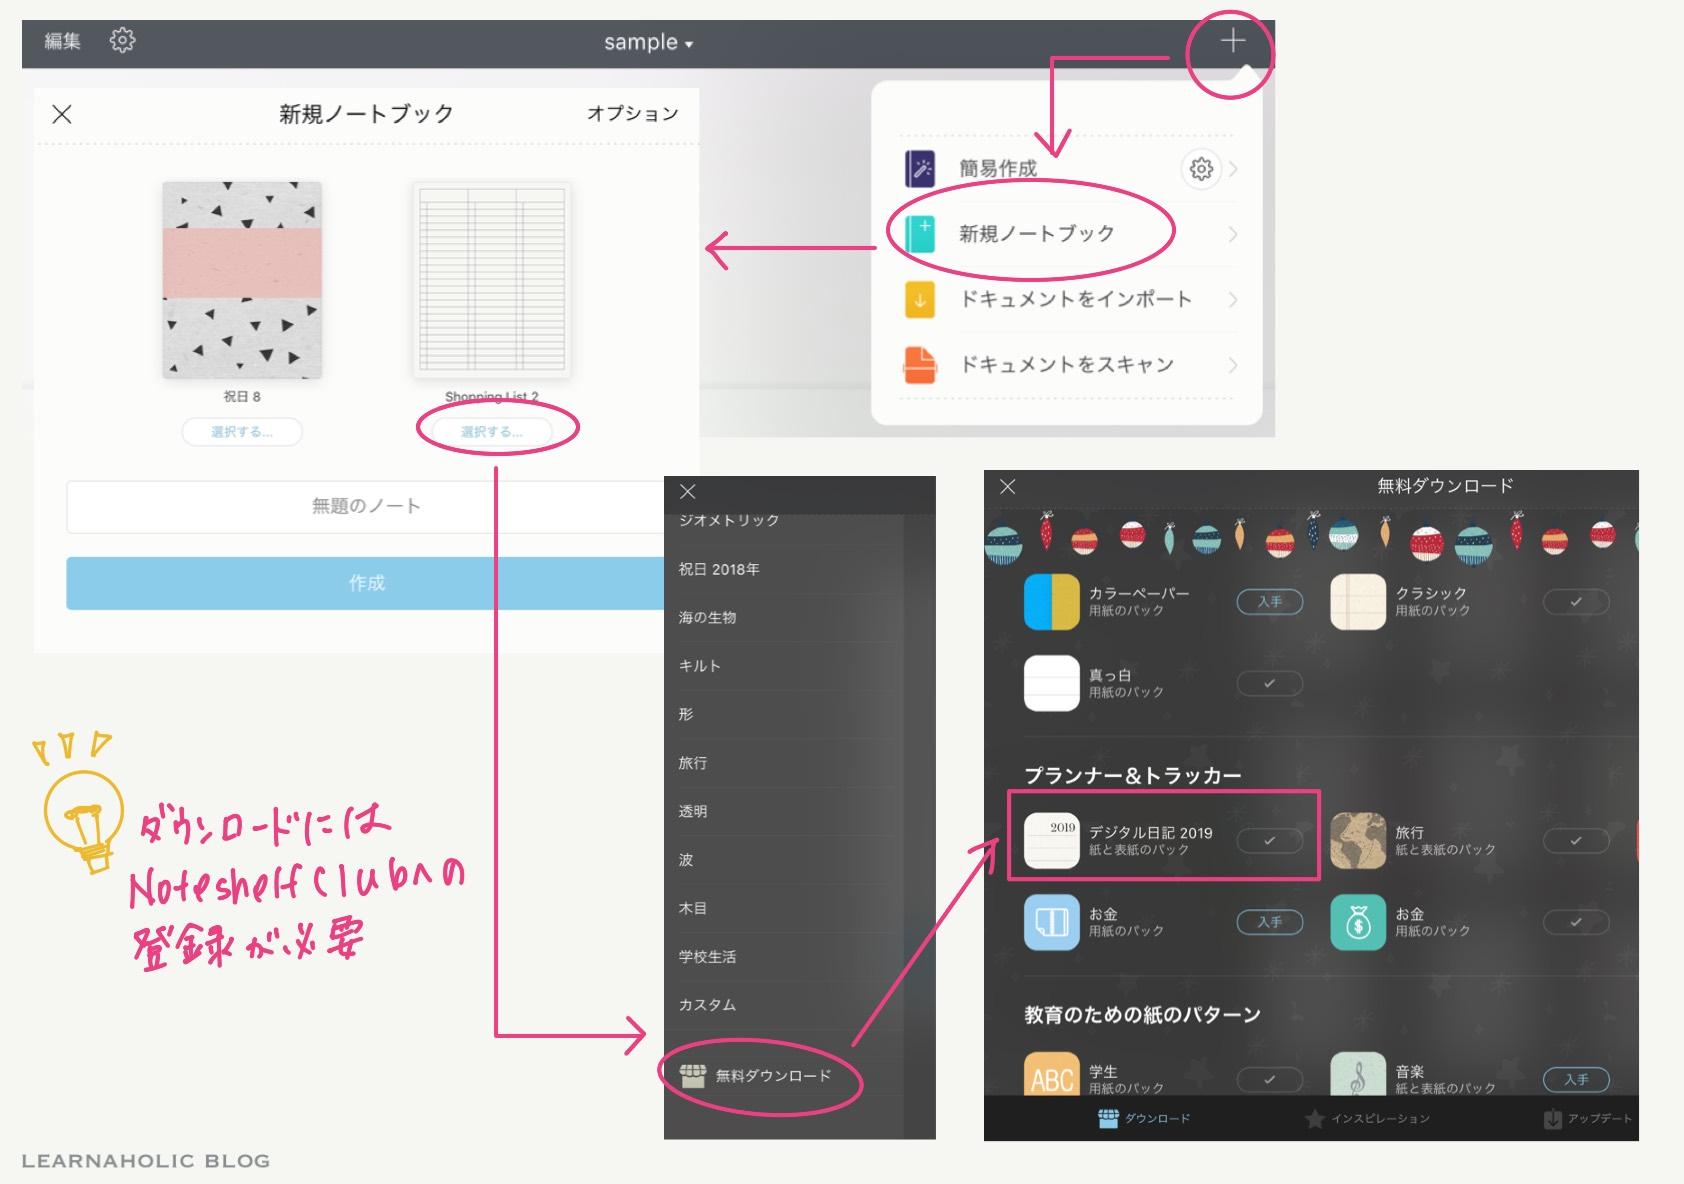 noteshelf2公式手帳テンプレート解説ダウンロード方法